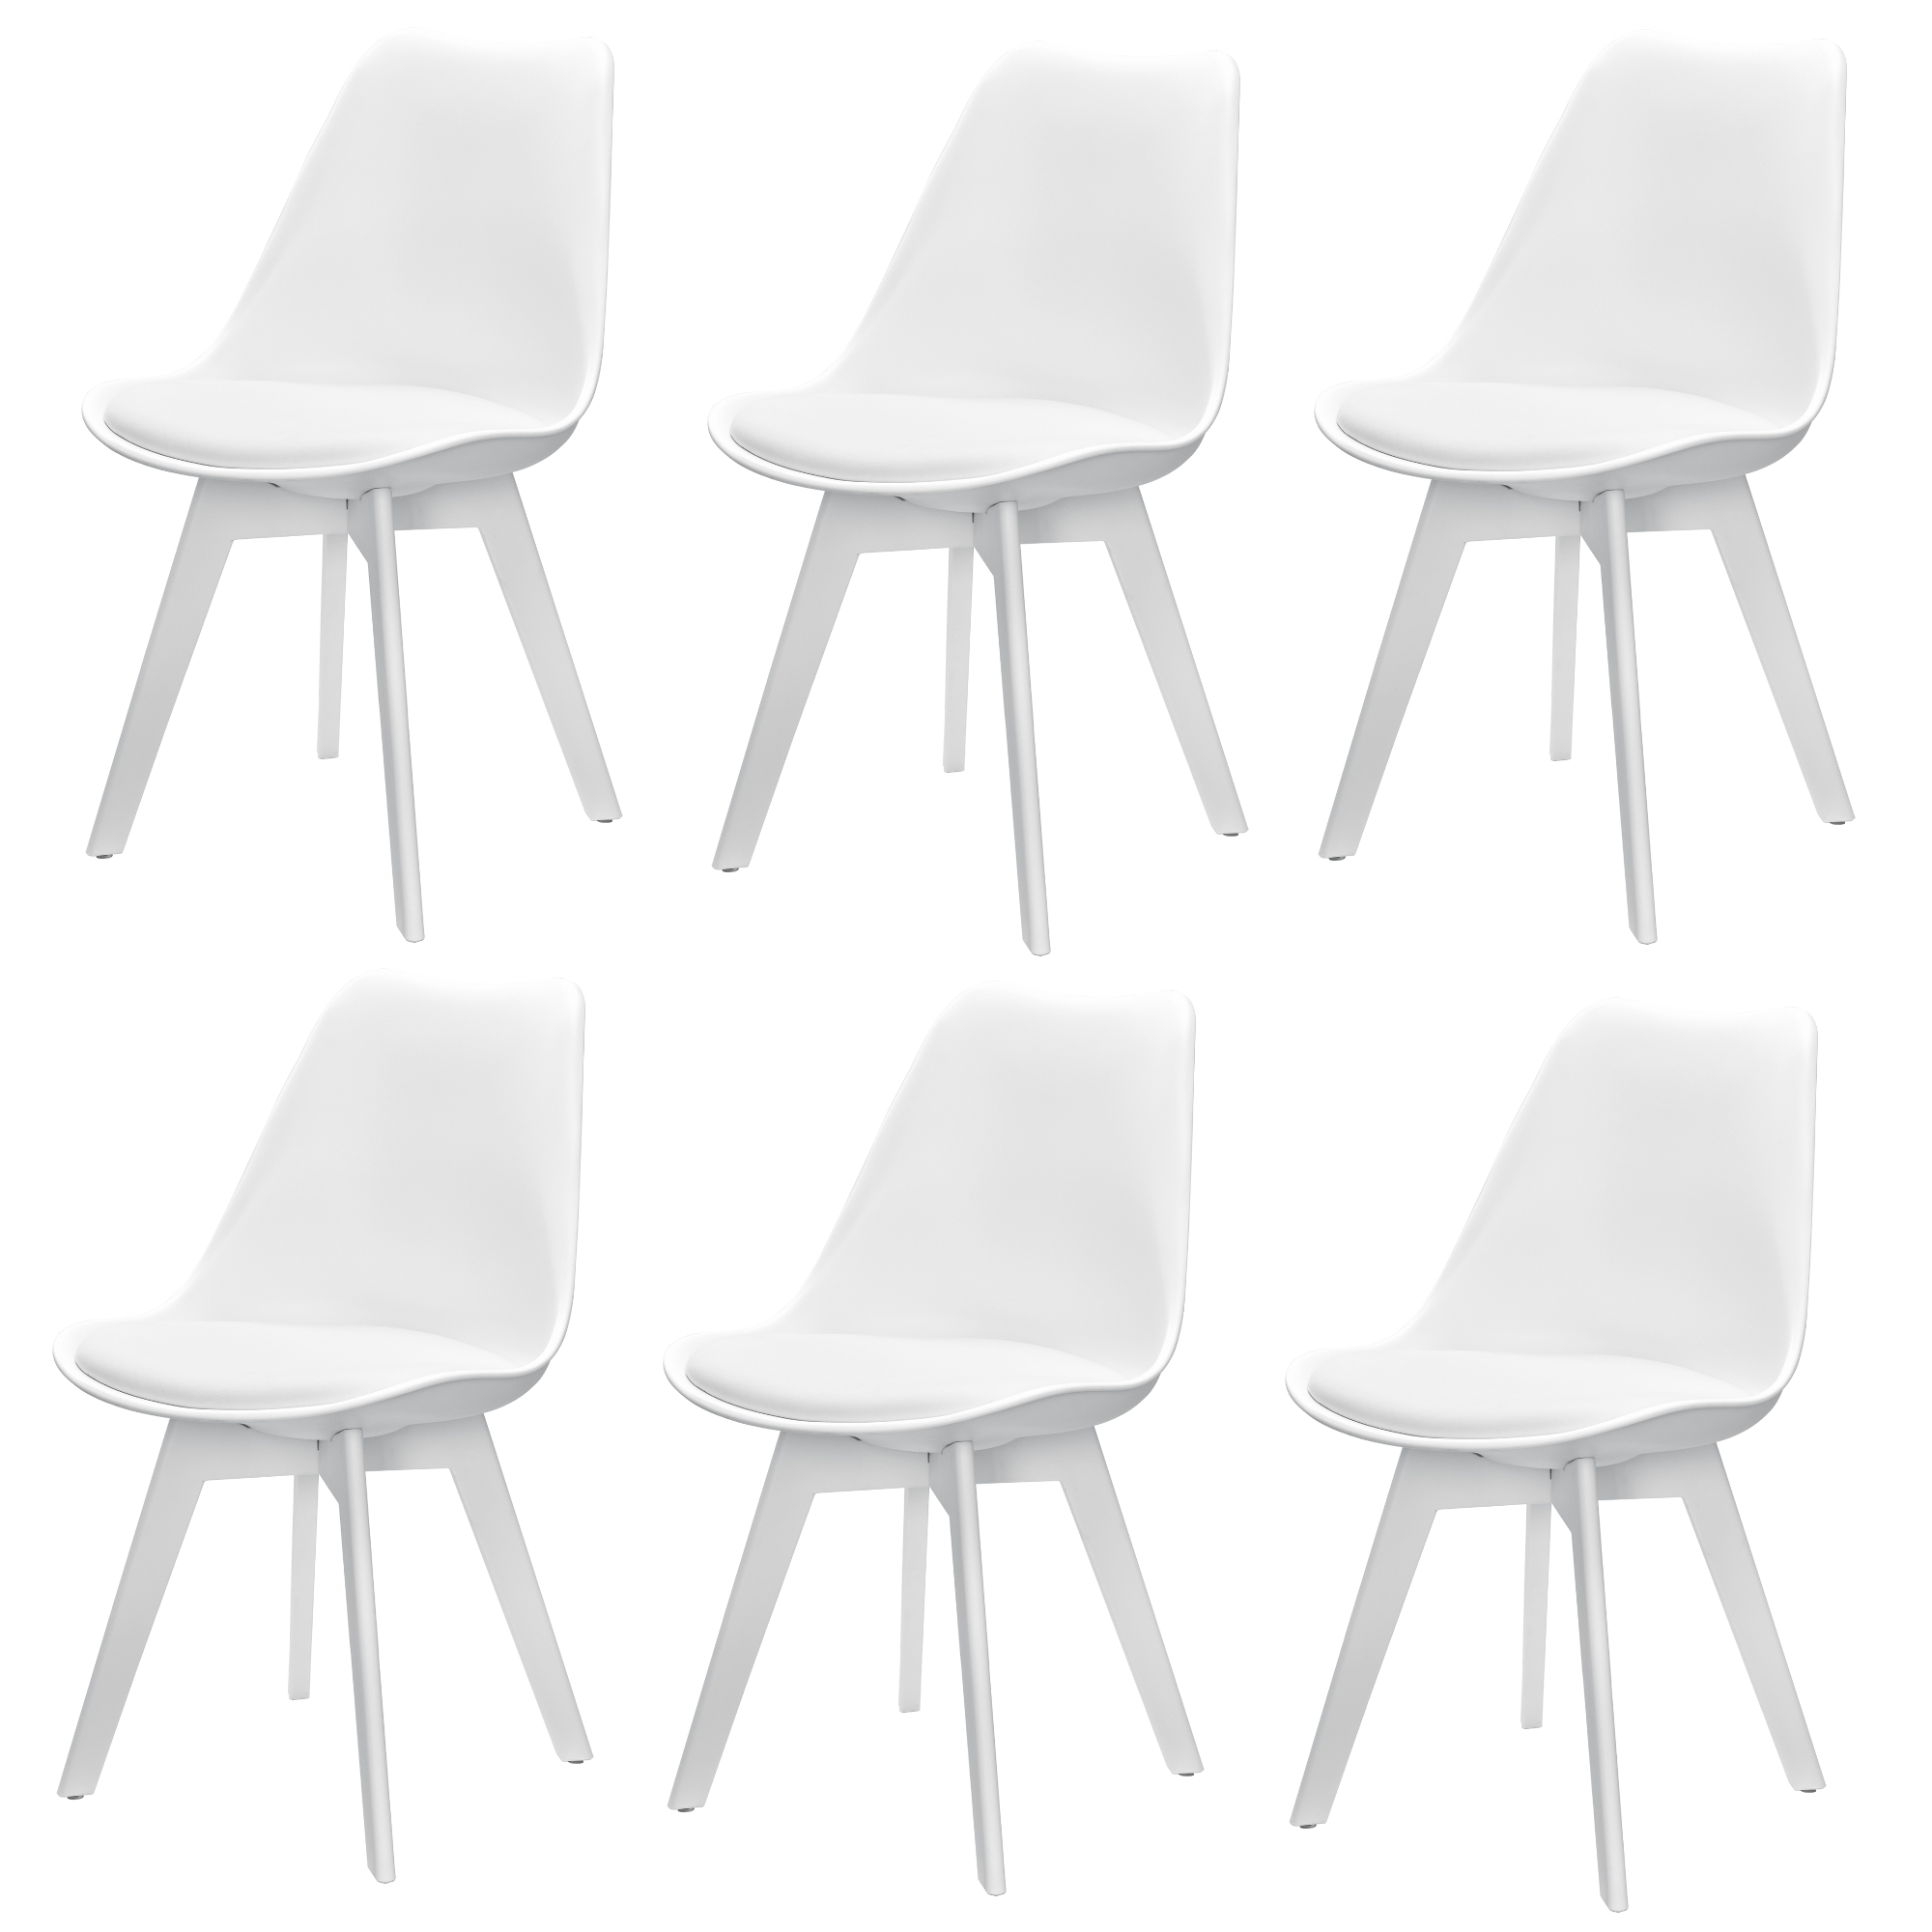 6x Design Sedie Sala Da Pranzo Bianco Sedia Plastica Cuoio Arte